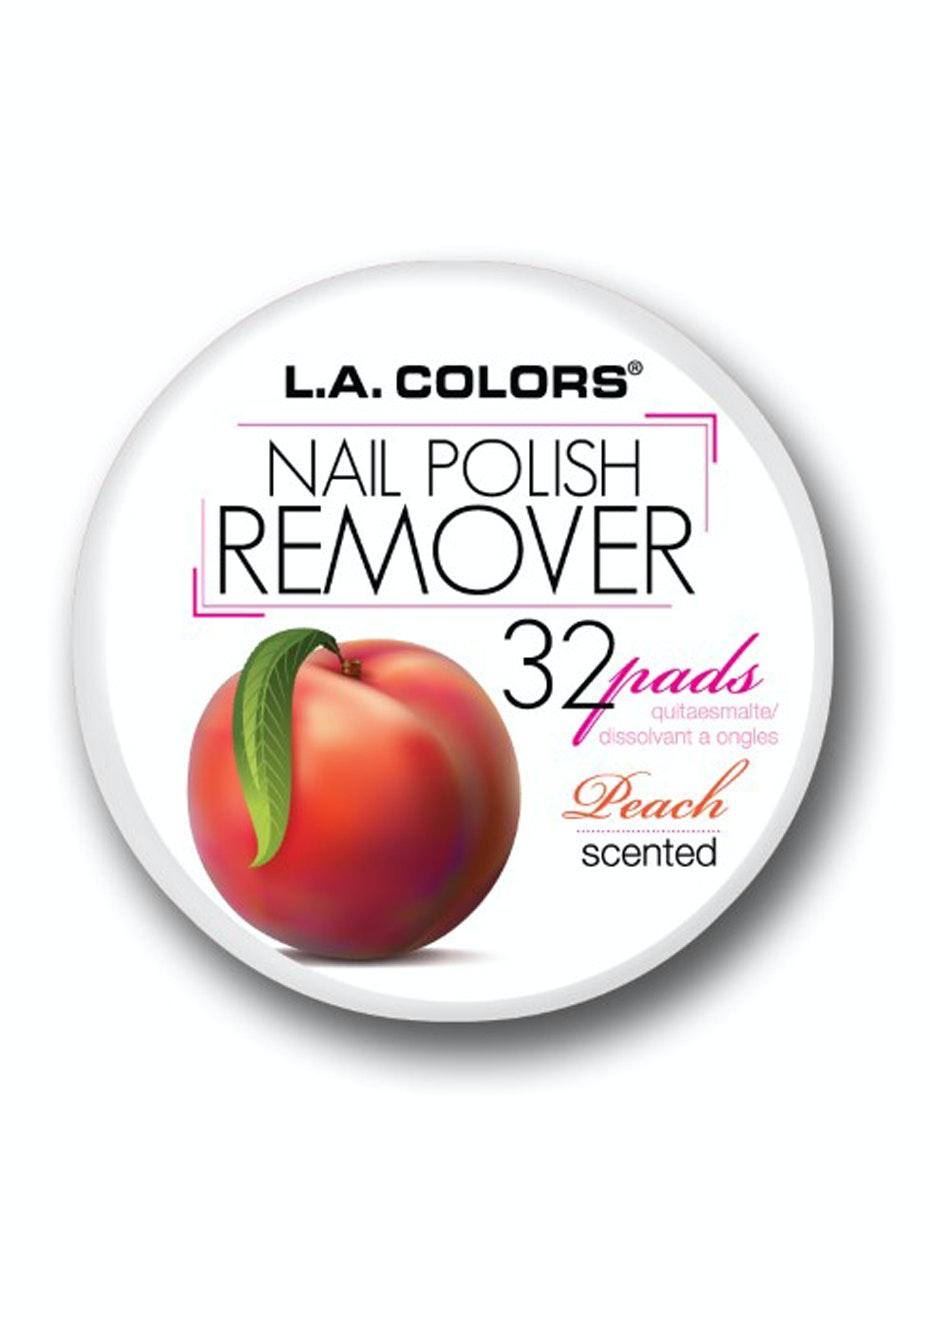 LA COLORS - Nail Polish Remover Pads  - Peach